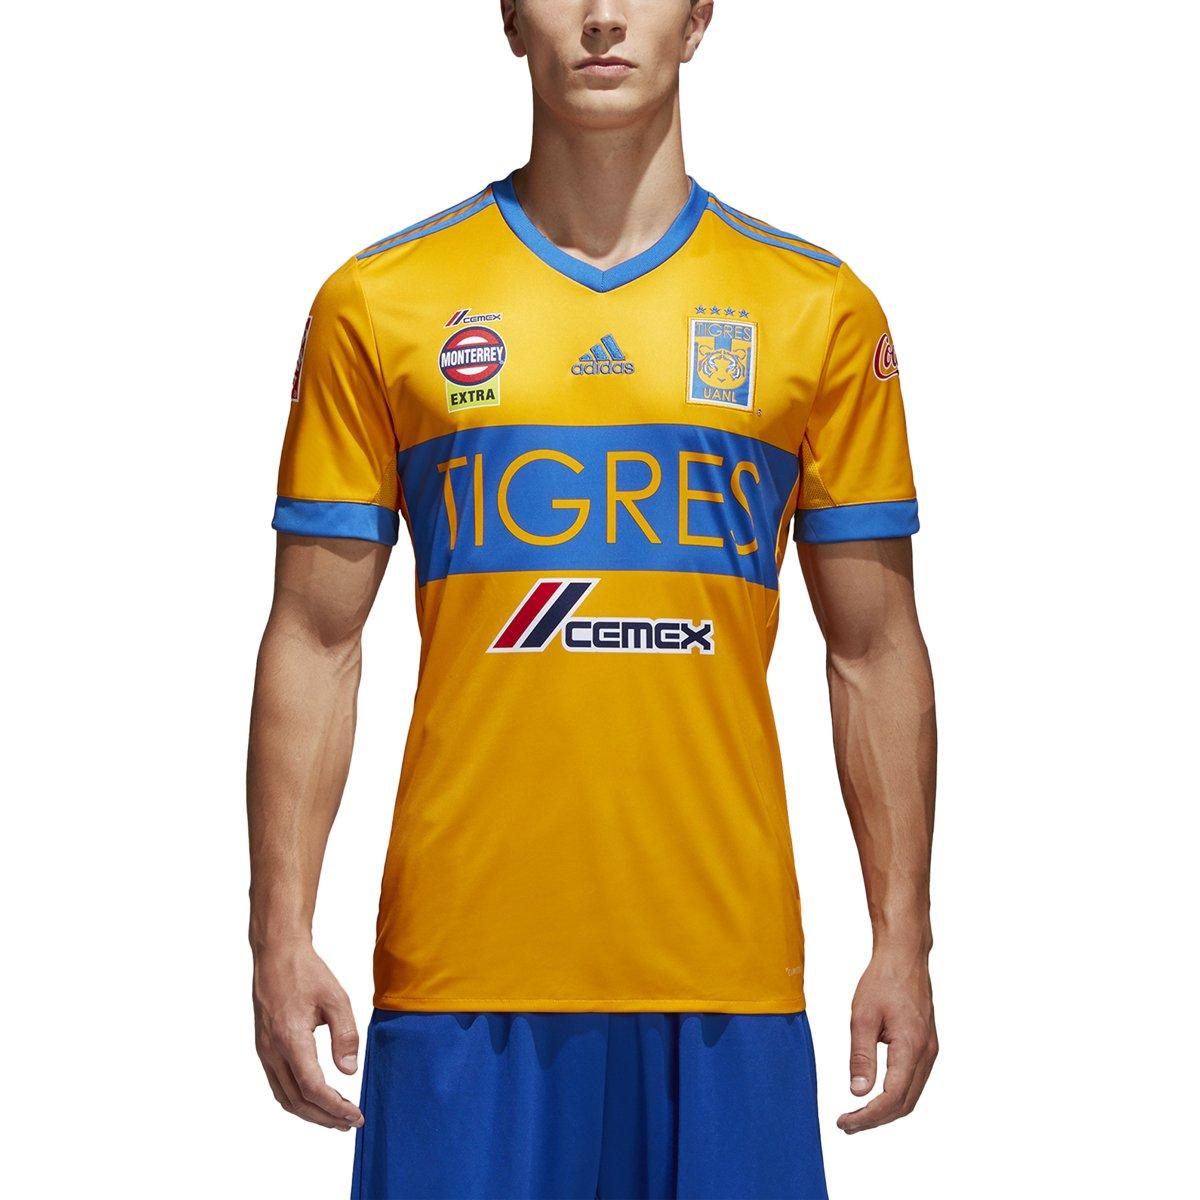 204b6ba82 Amazon.com  adidas Men s Soccer Tigres UANL Home Jersey  Clothing